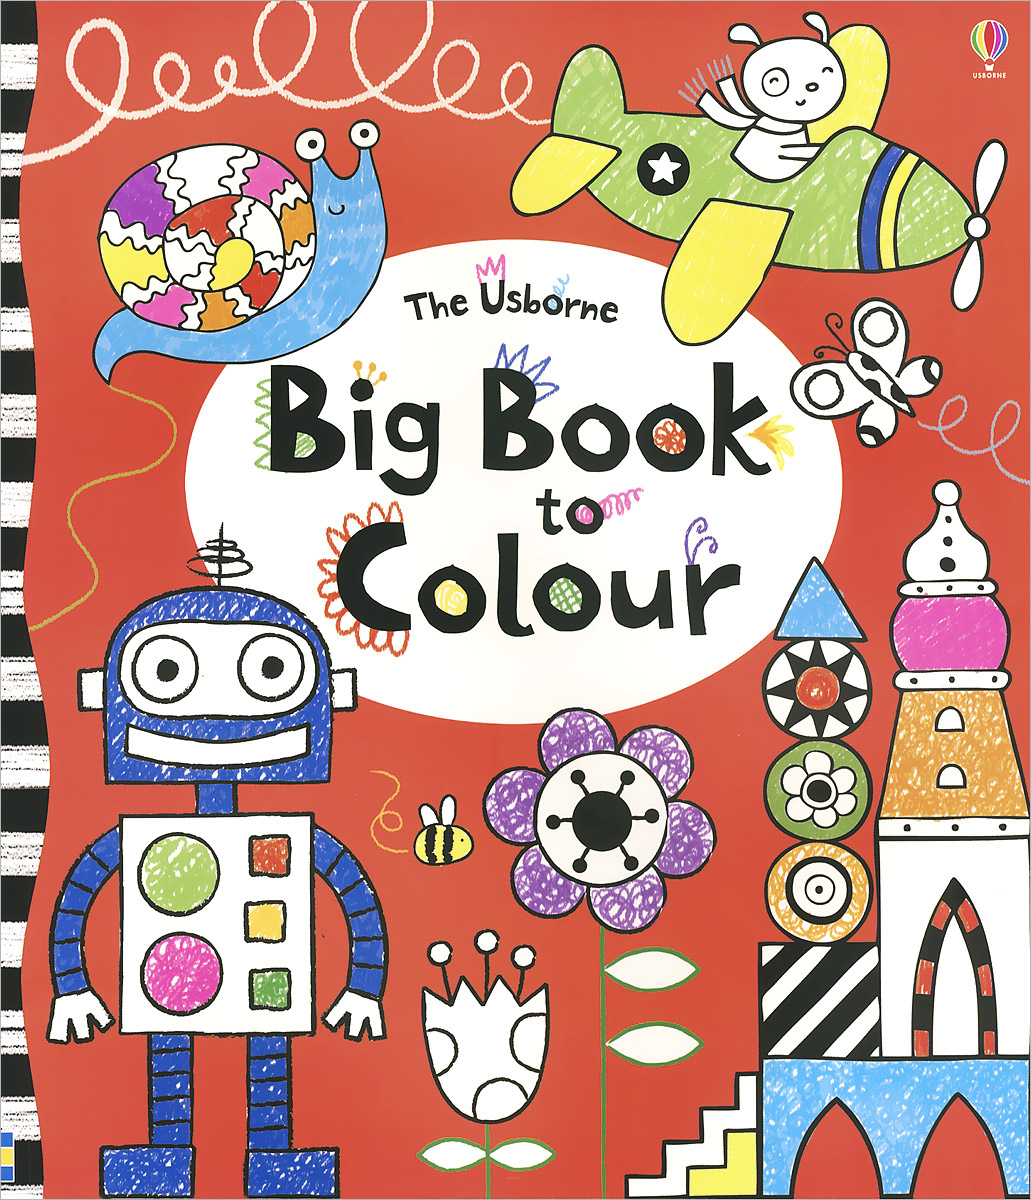 The Usborne Big Book to Colour the usborne big book of sea creatures big books page 4